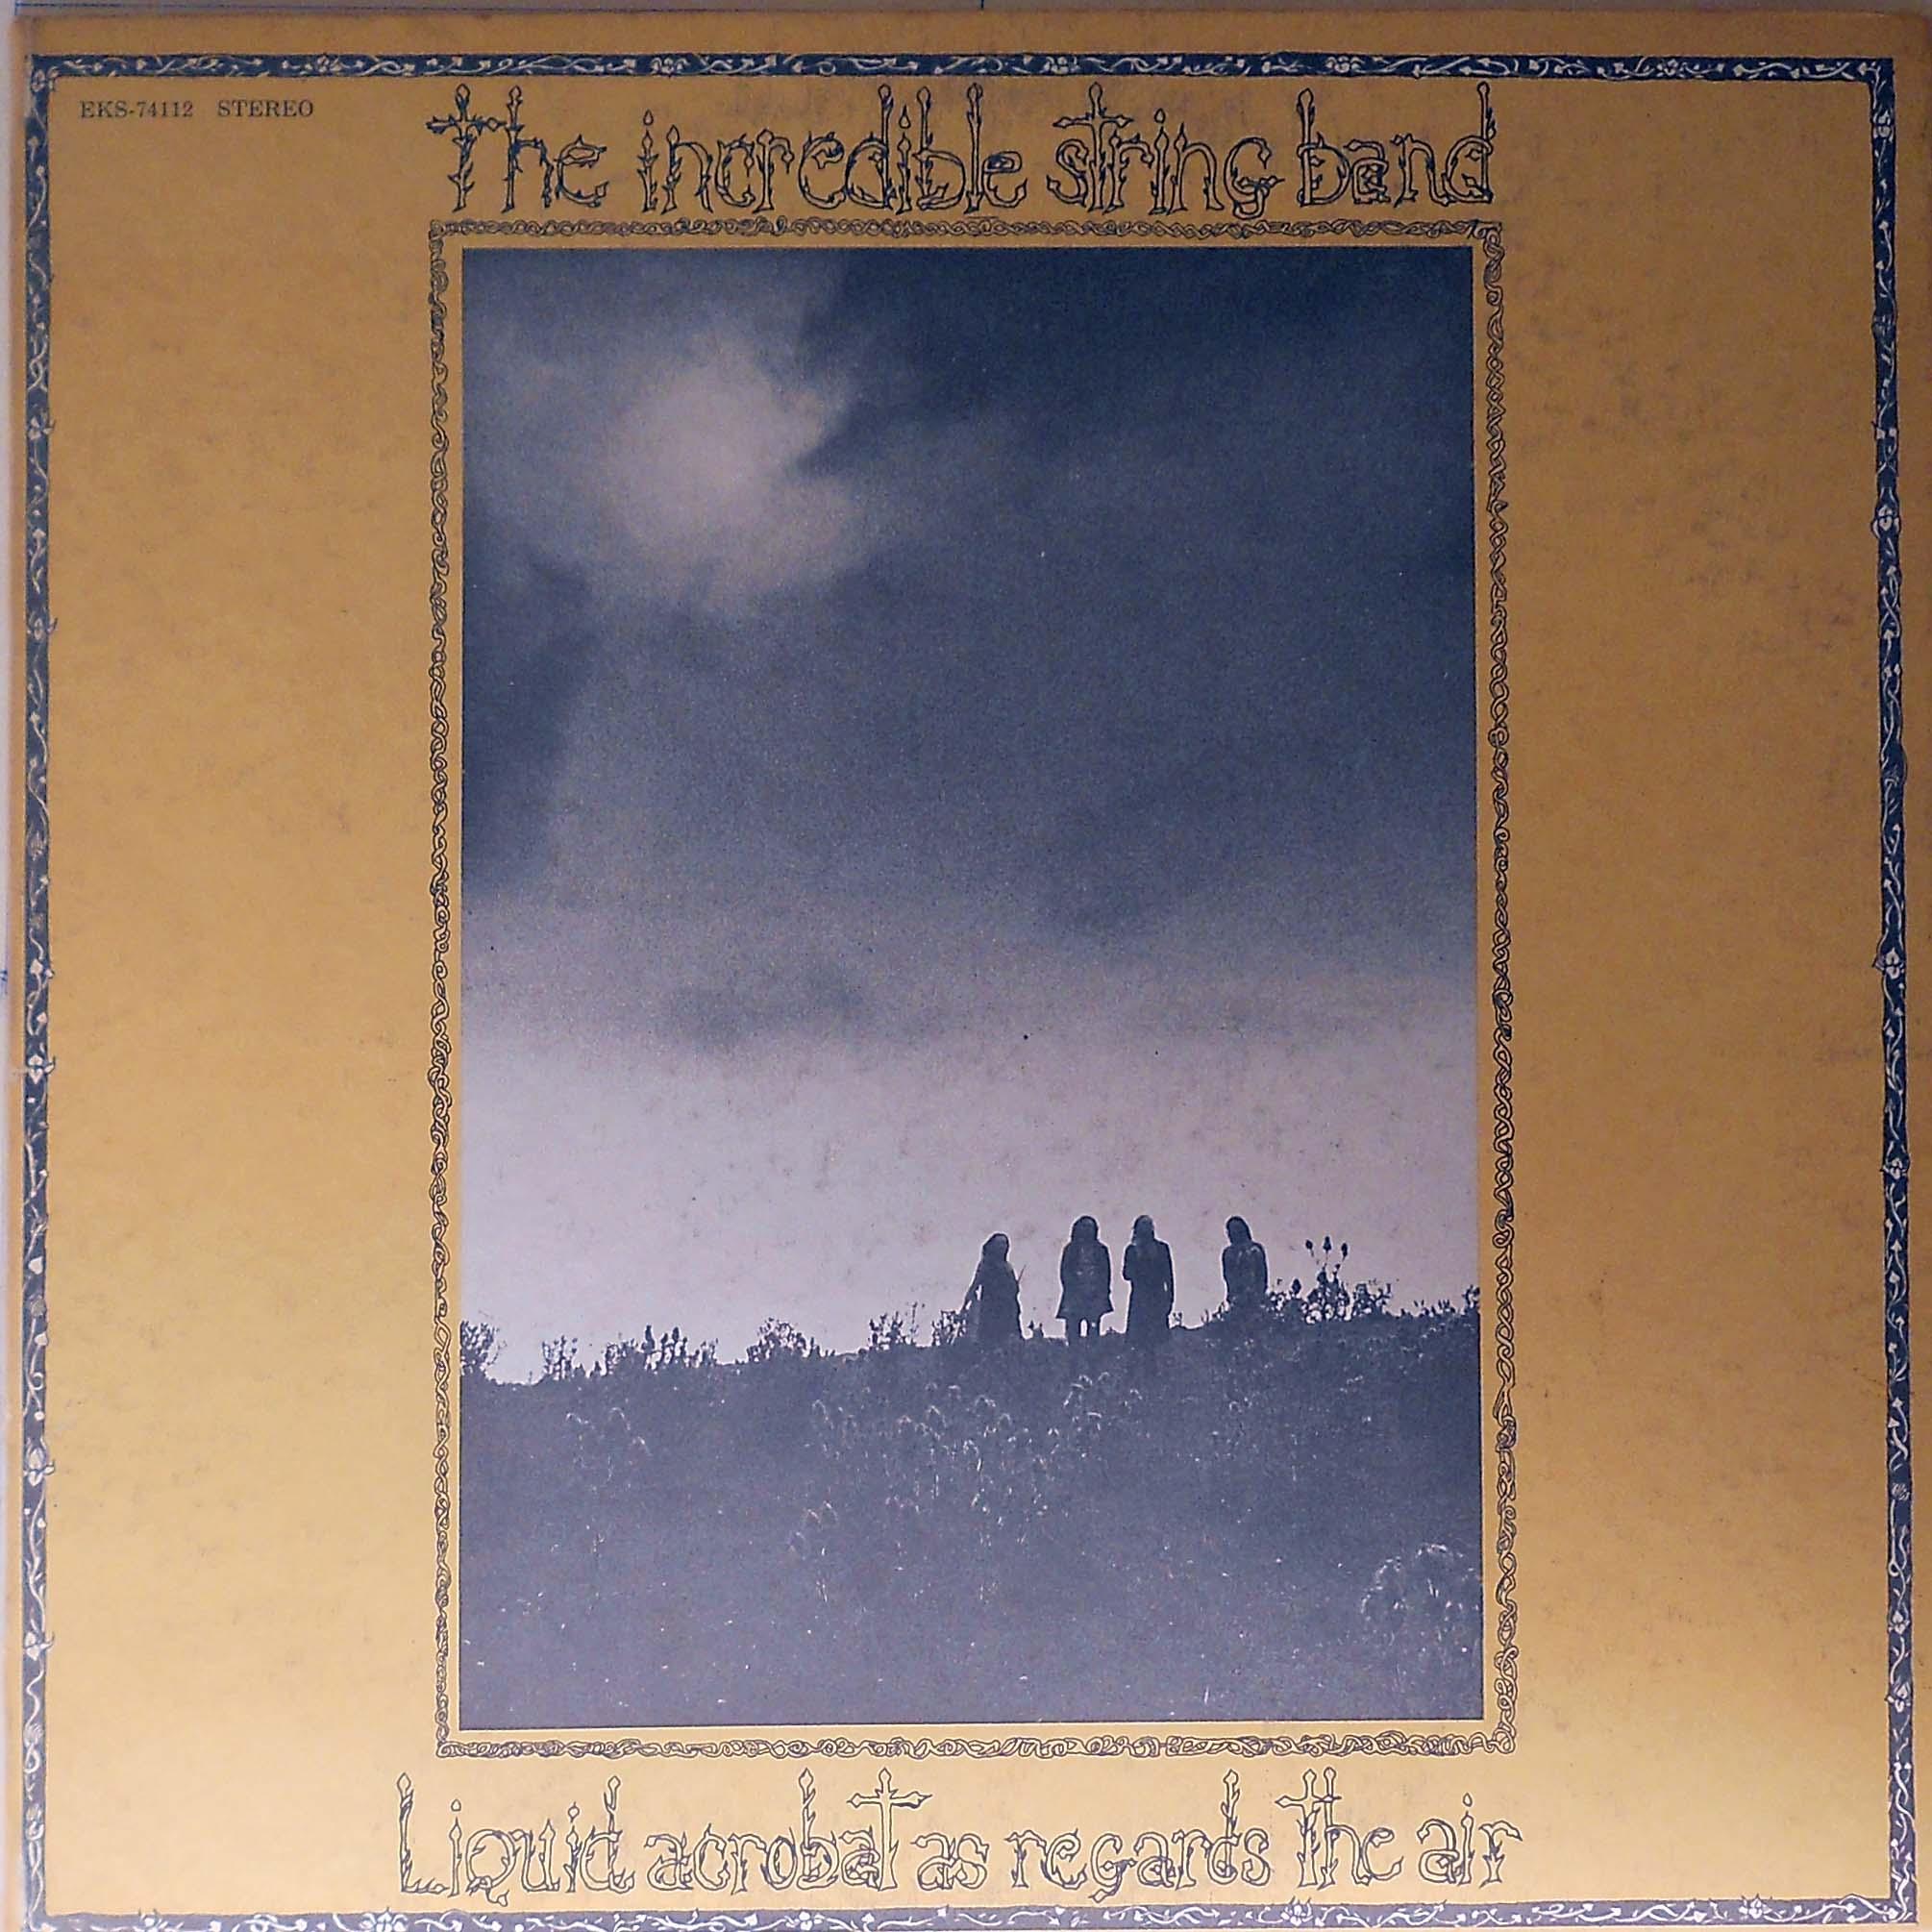 Incredible String Band - Liquid Acrobat As Regards The Air Album